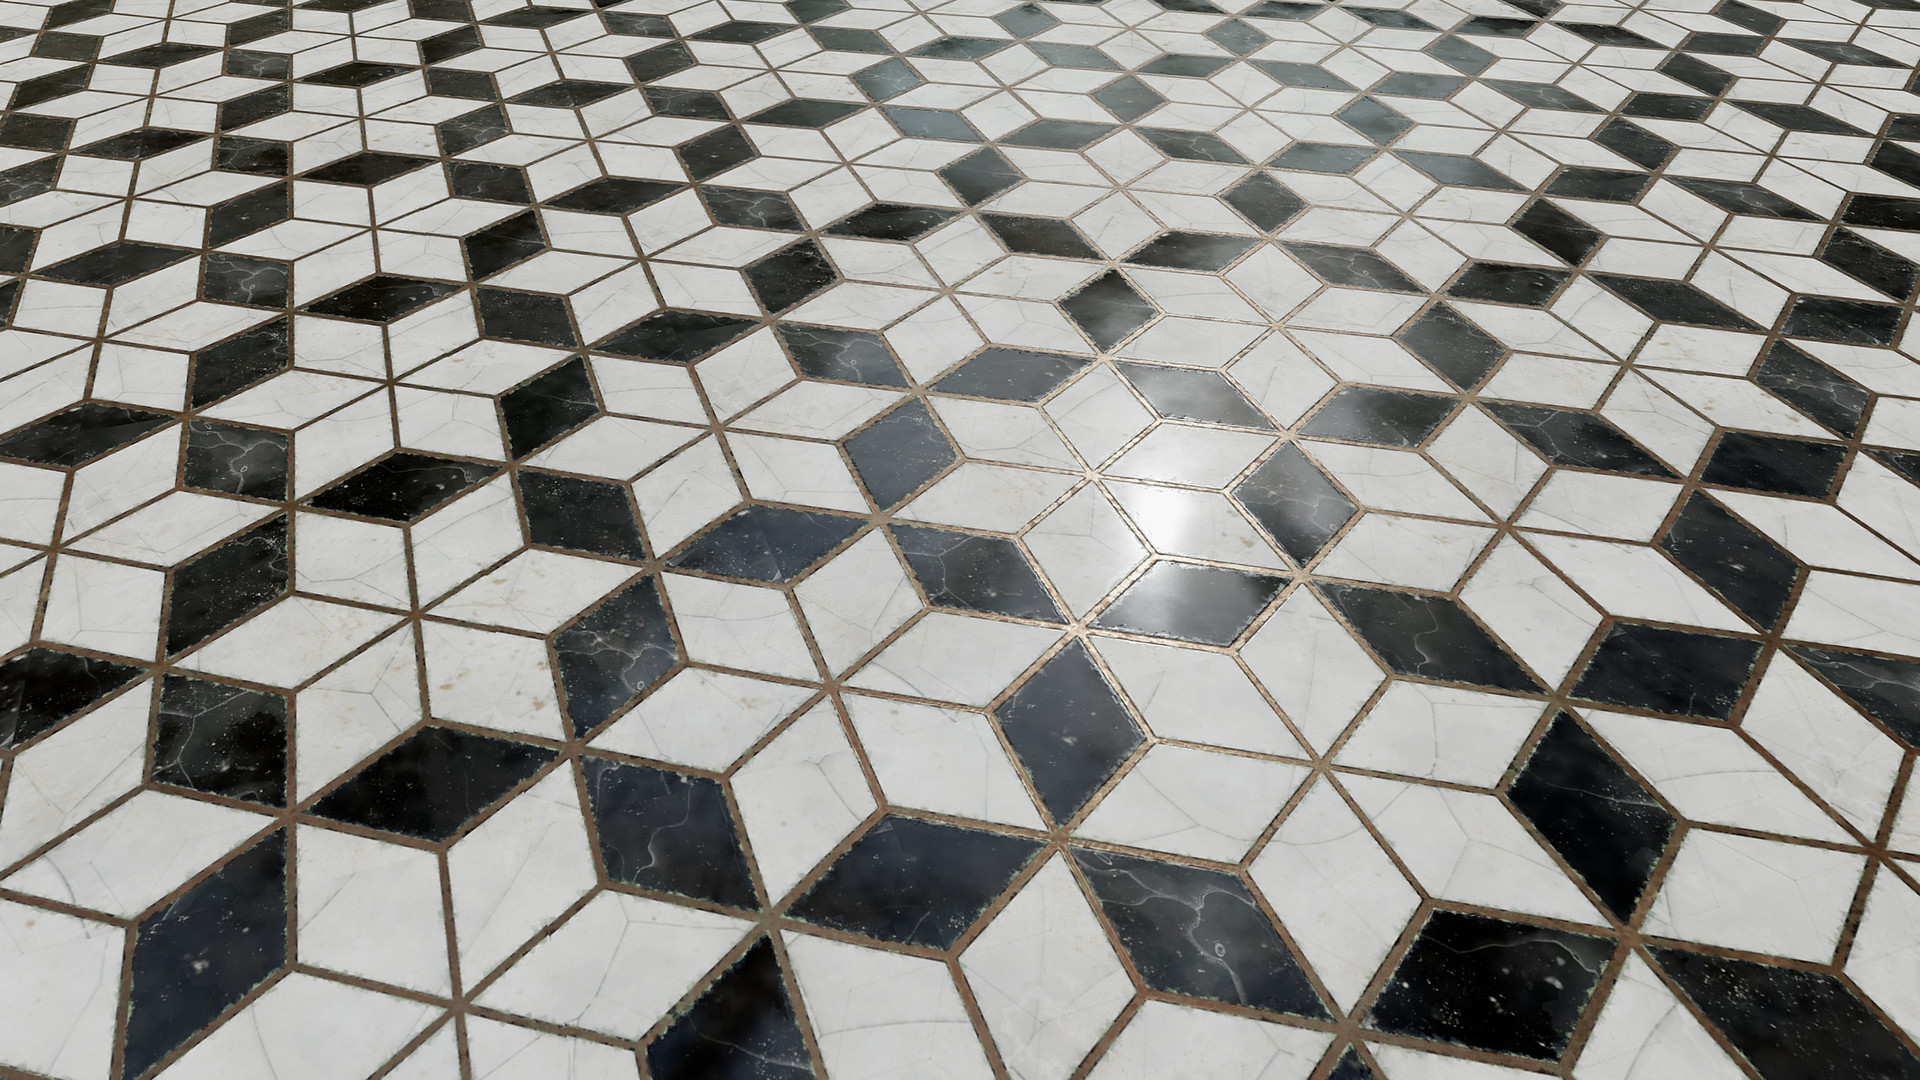 Mine yilmaz ulas marble foor tiles